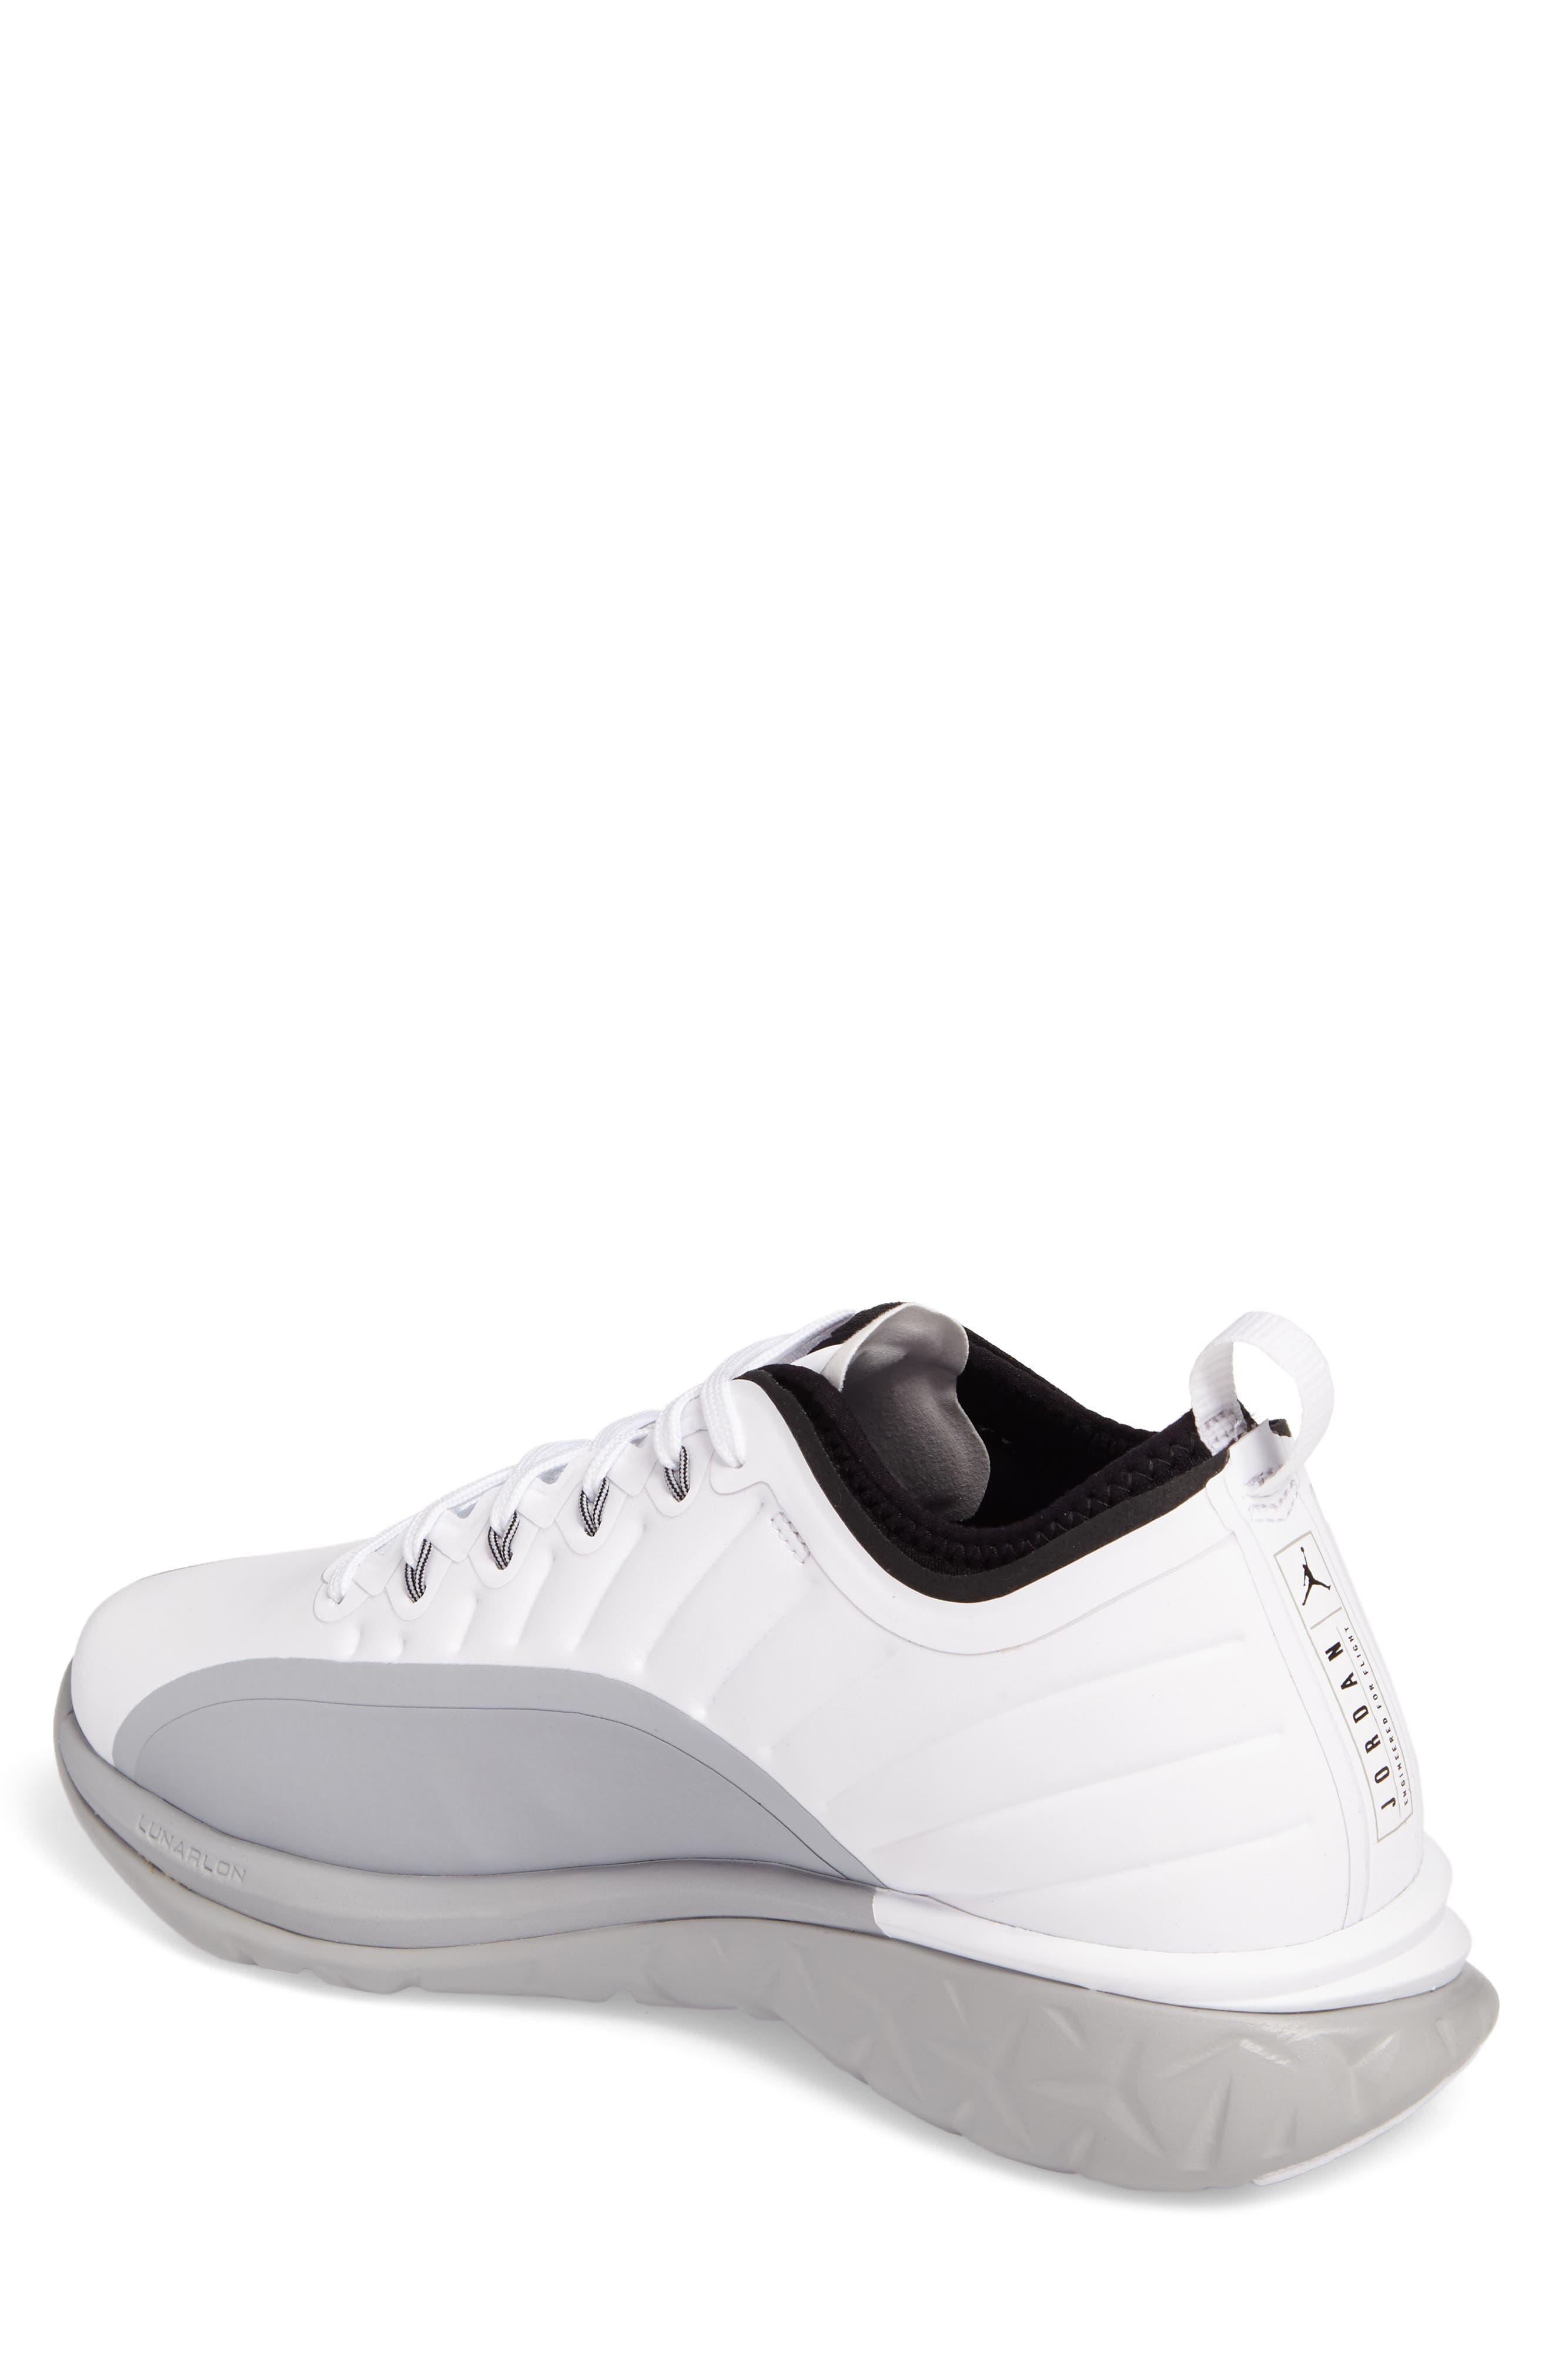 Alternate Image 2  - Nike Jordan Trainer Prime Sneaker (Men)